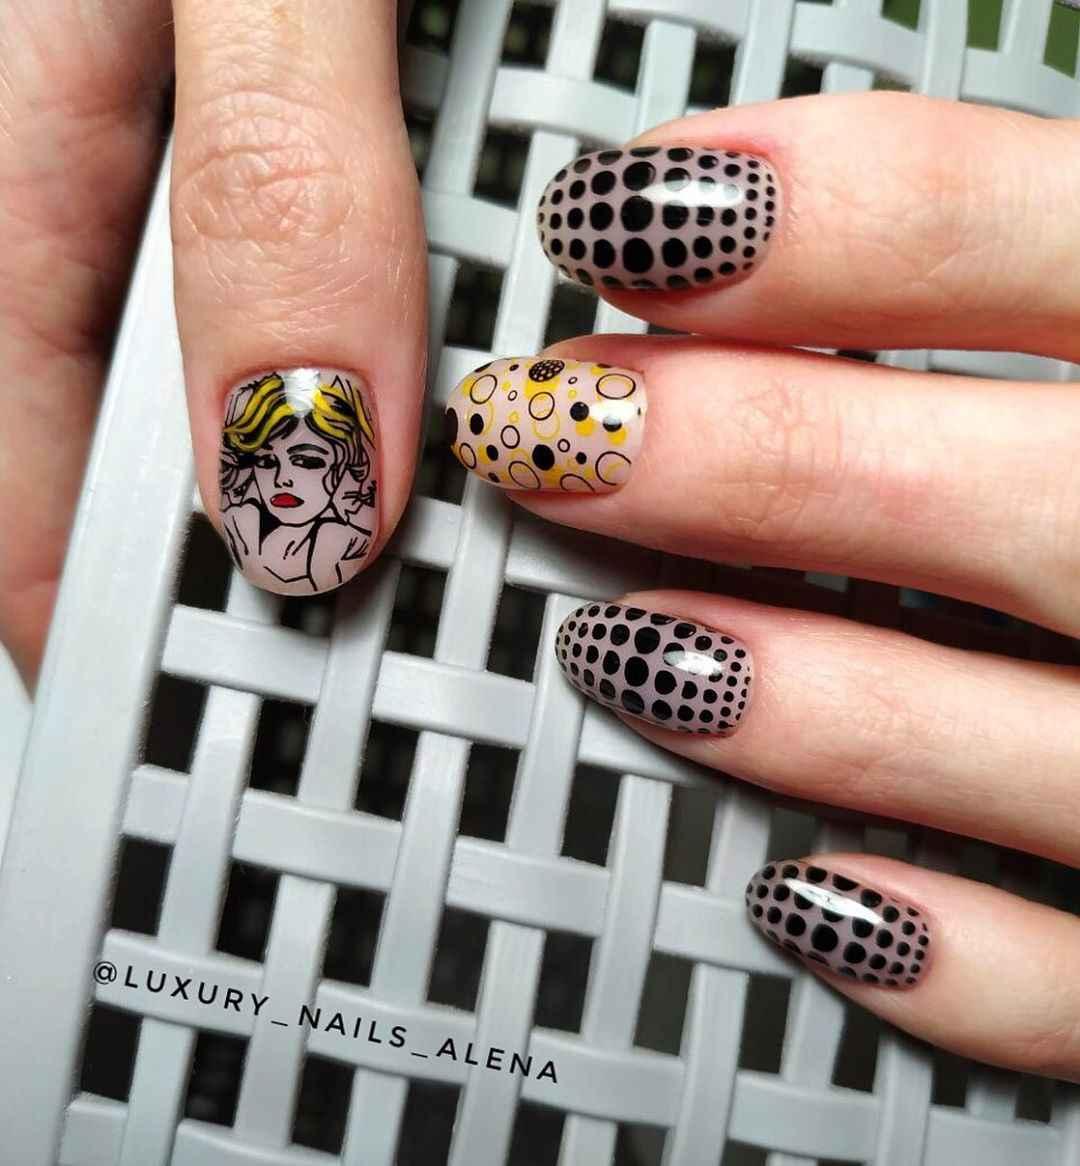 Маникюр с лицами на ногтях фото_24